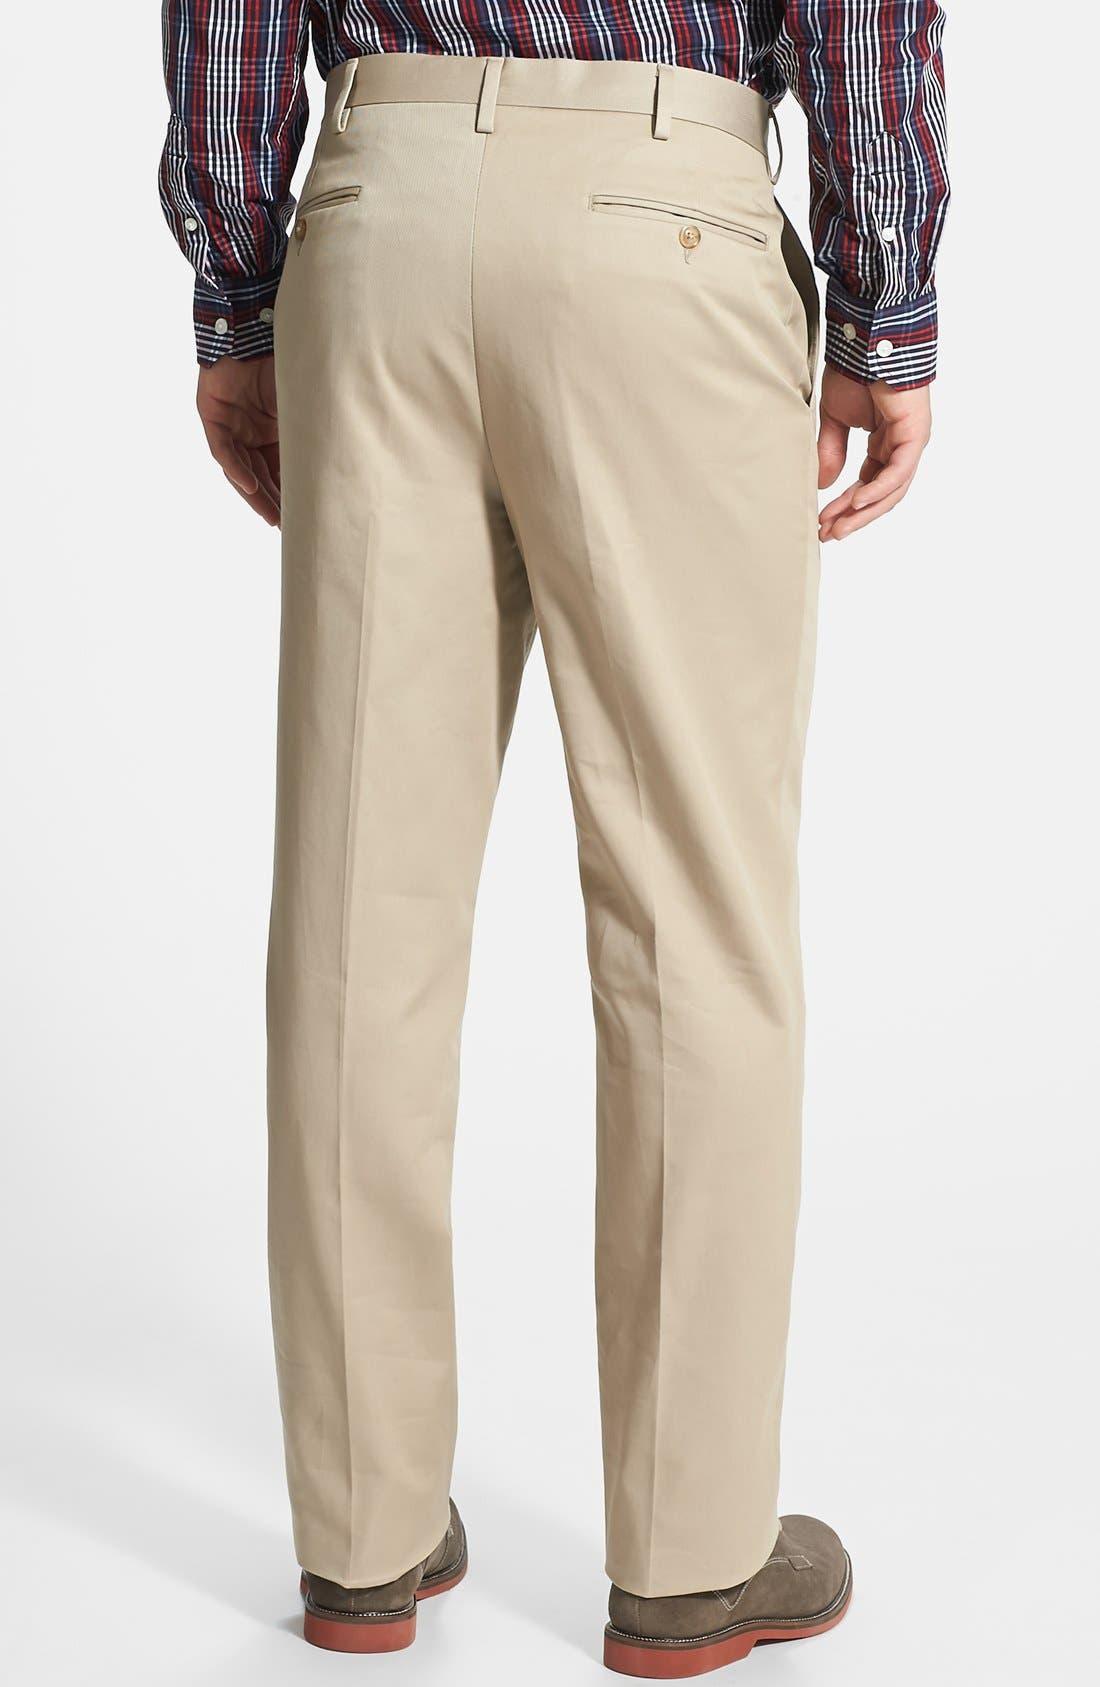 Flat Front Wrinkle Resistant Cotton Trousers,                             Alternate thumbnail 3, color,                             Khaki